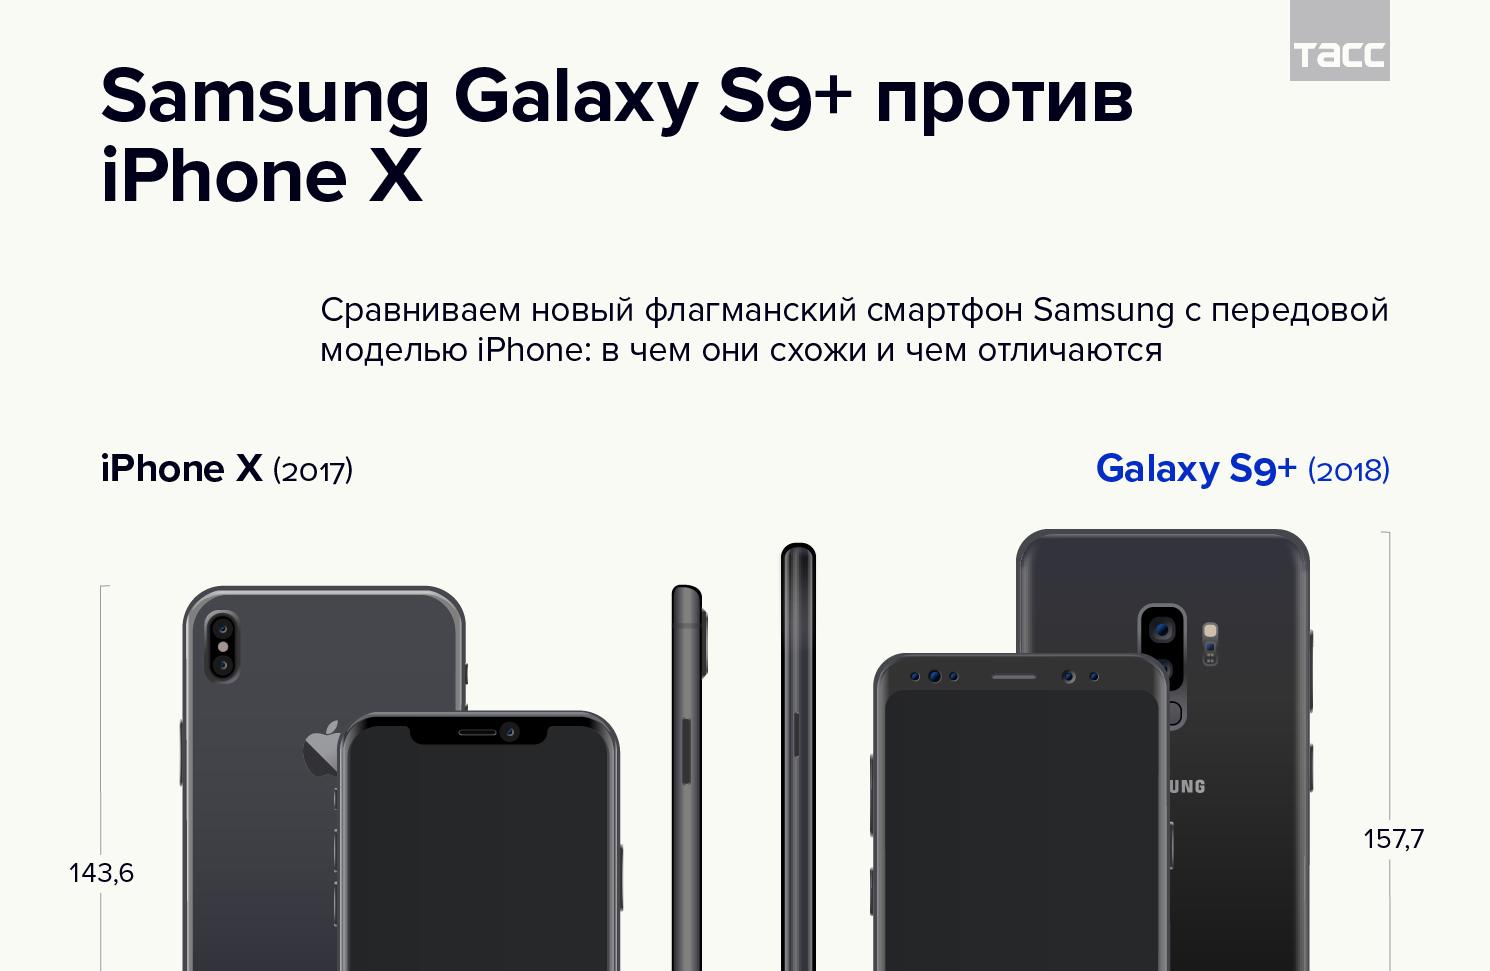 Сравнение Samsung Galaxy S9+ и iPhone X